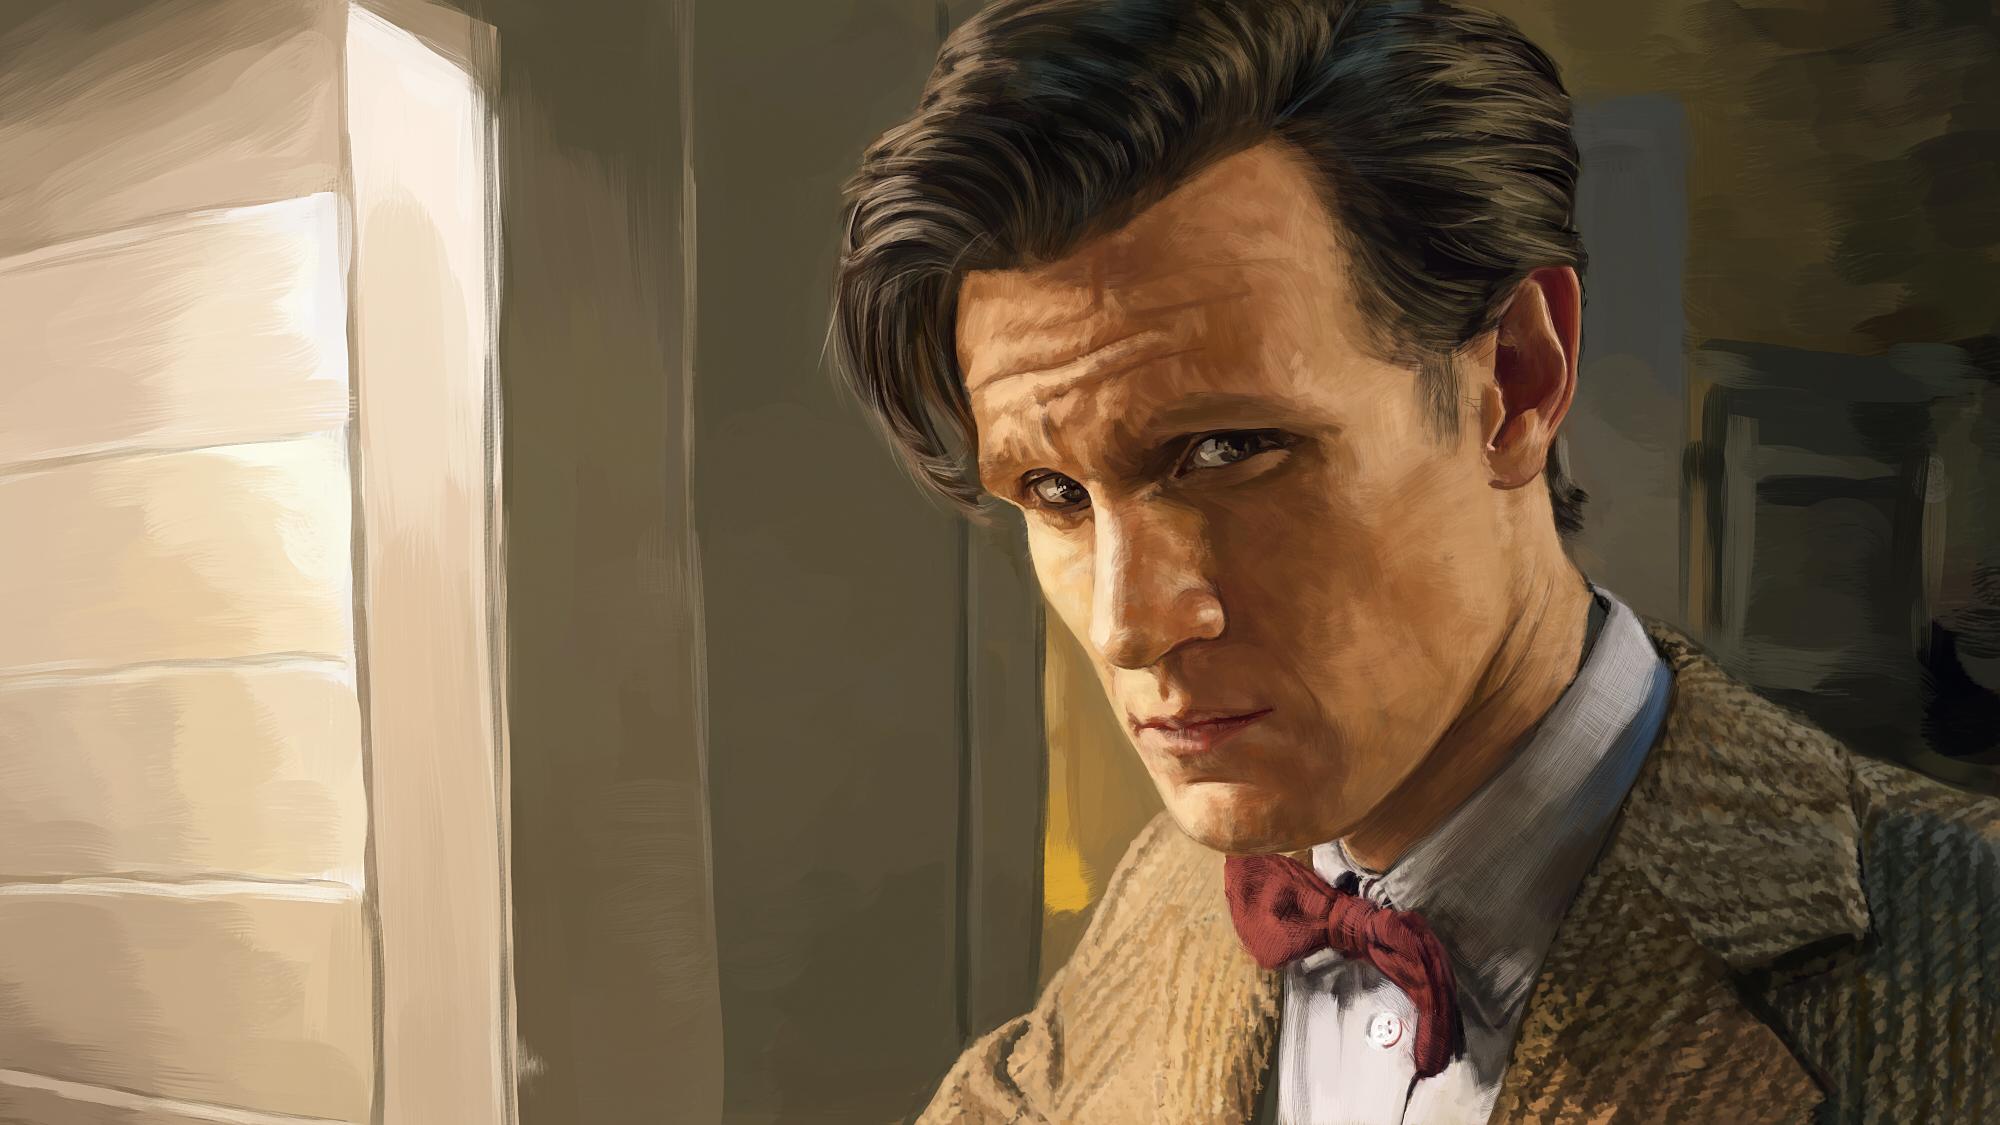 Doctor Who Eleventh Doctor Matt Smith Wallpaper Hd Tv Series 4k